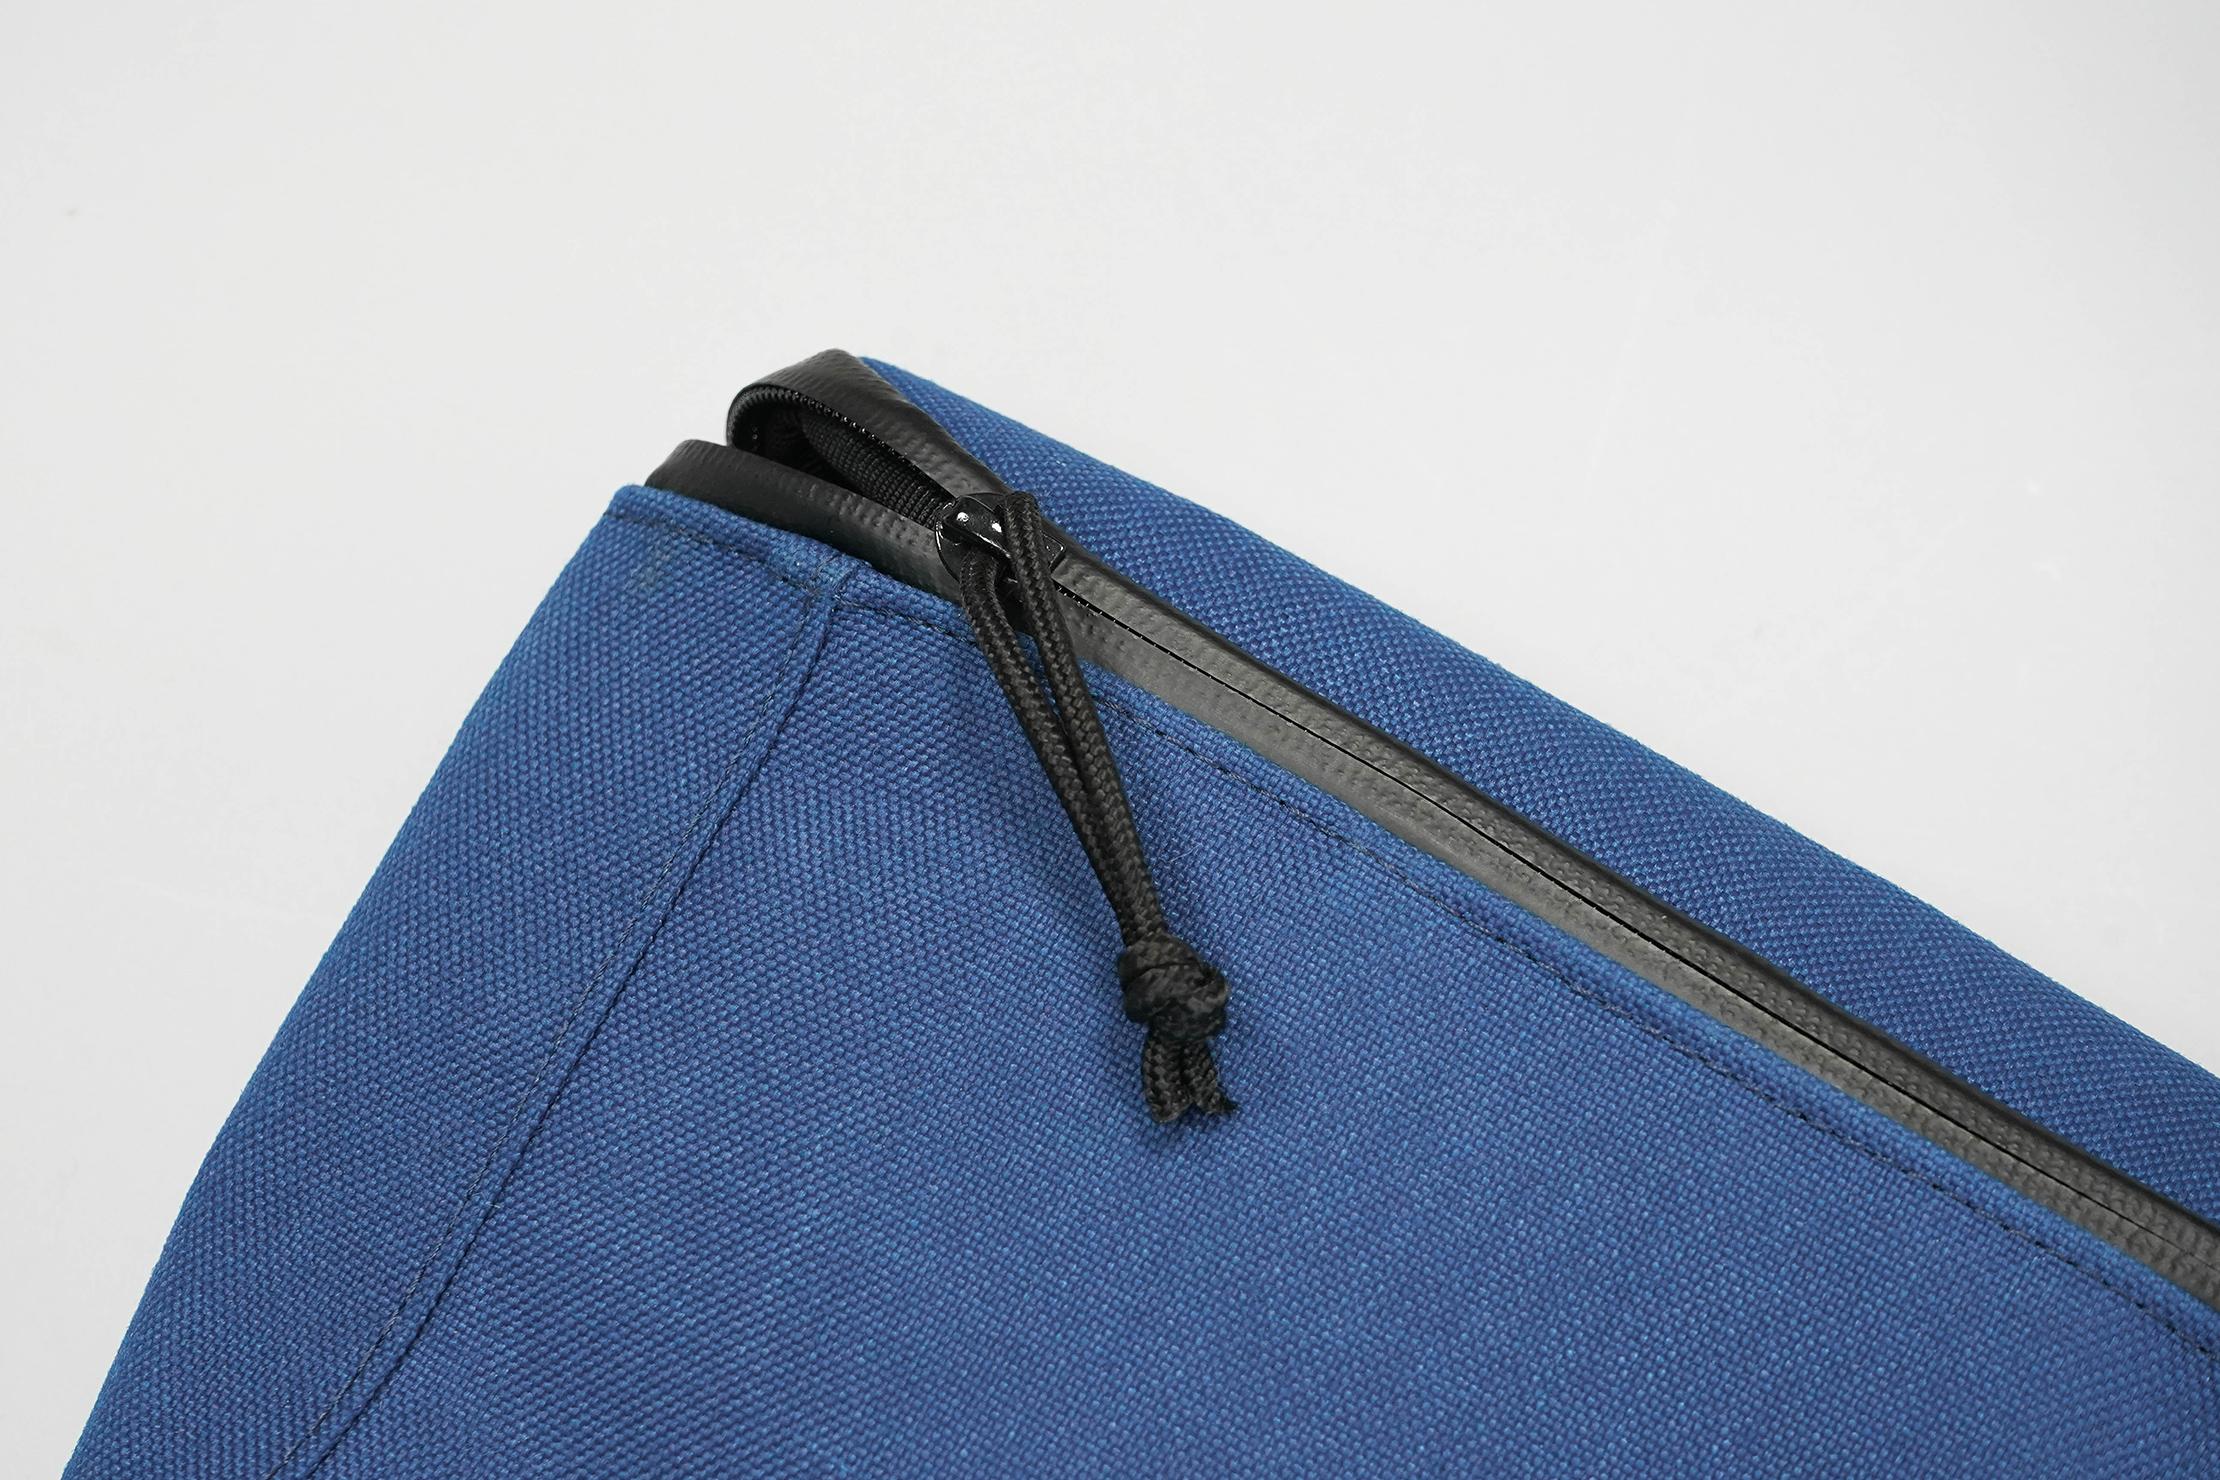 Chrome Cardiel Shank Zipper